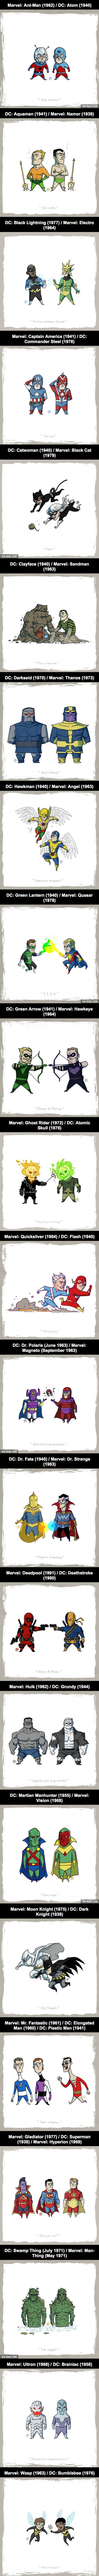 DC vs Marvel Hero Comparison